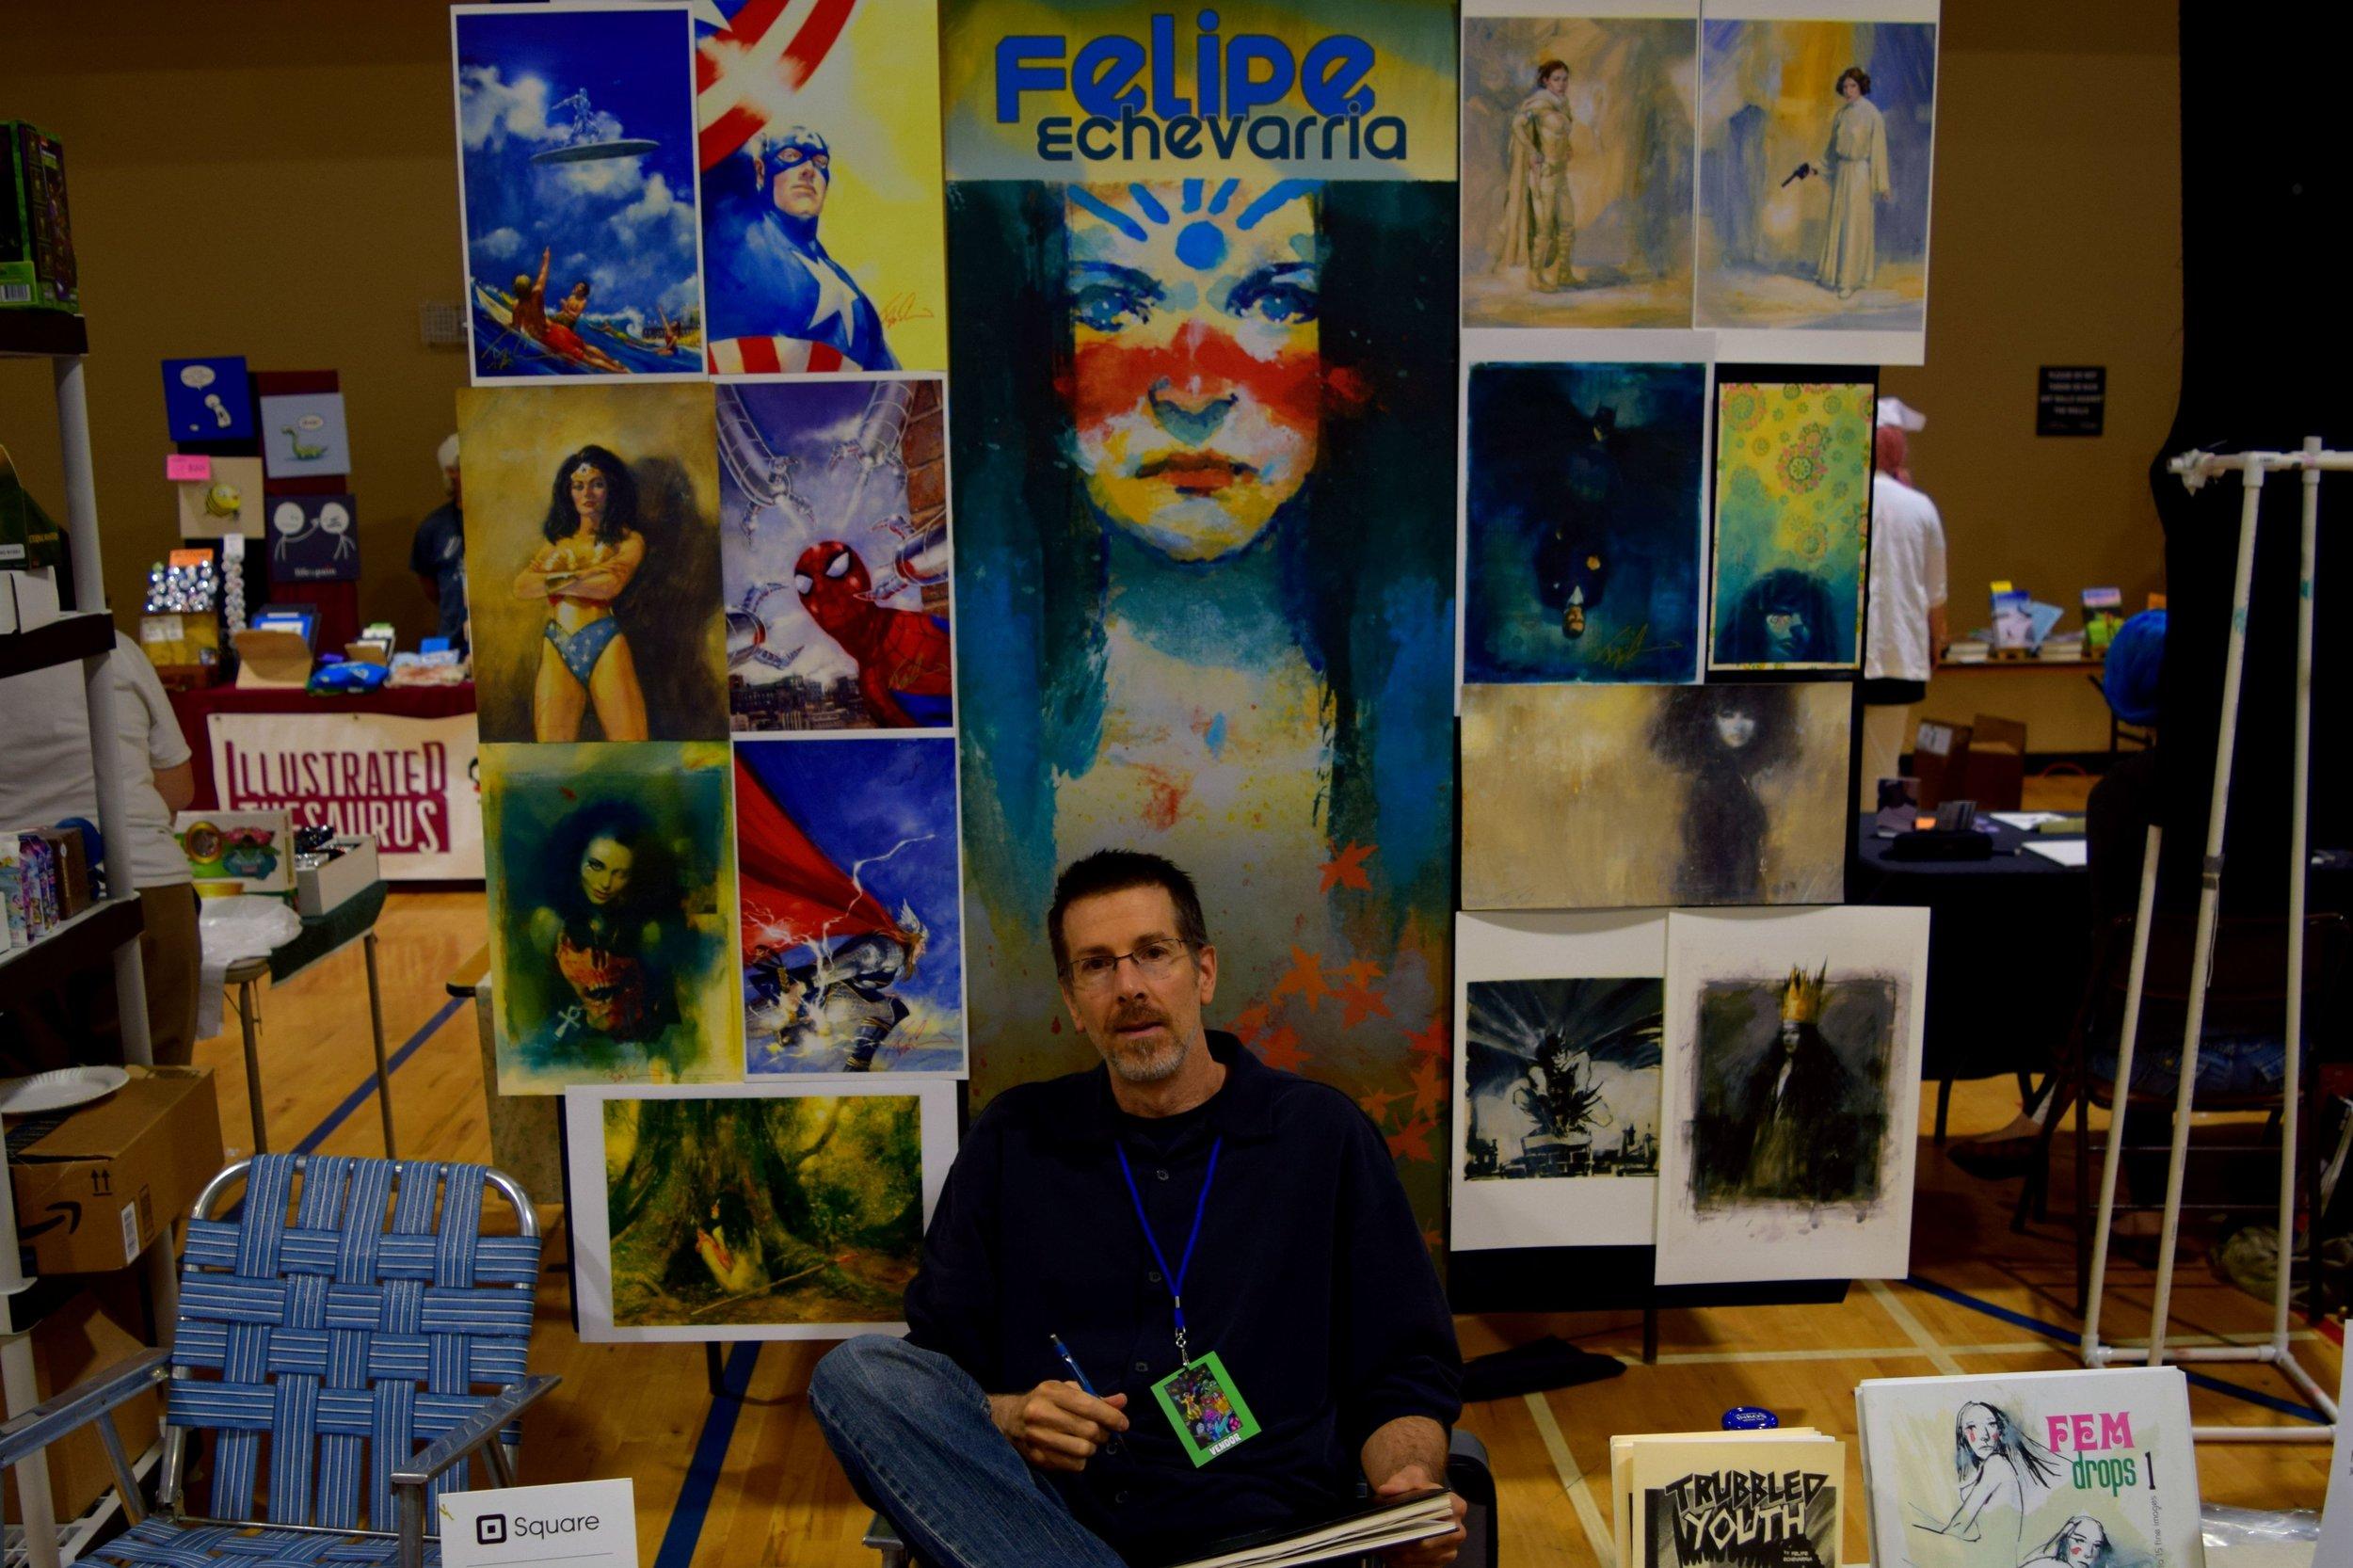 Felipe Echevarria at Fort Collins Comic Con 2016.